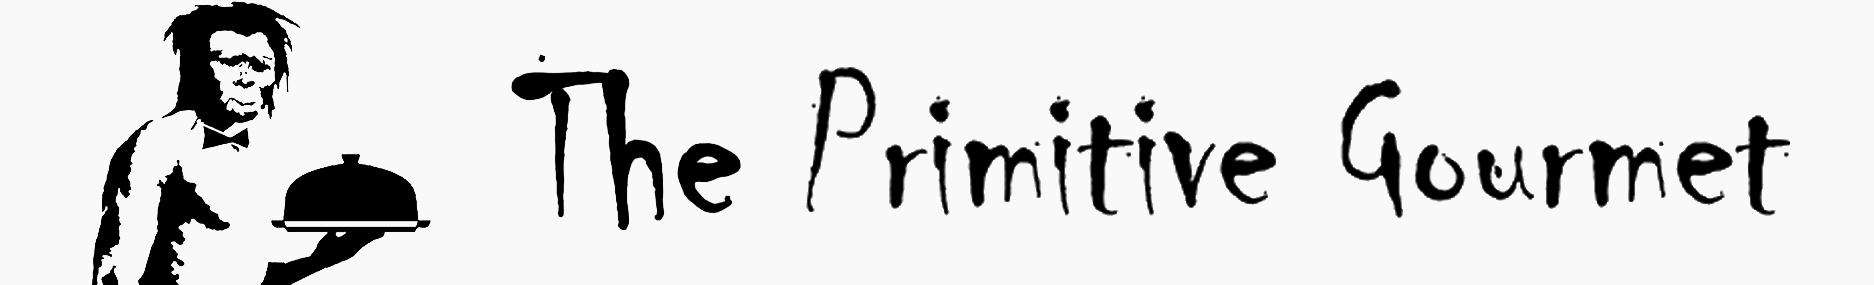 The Primitive Gourmet